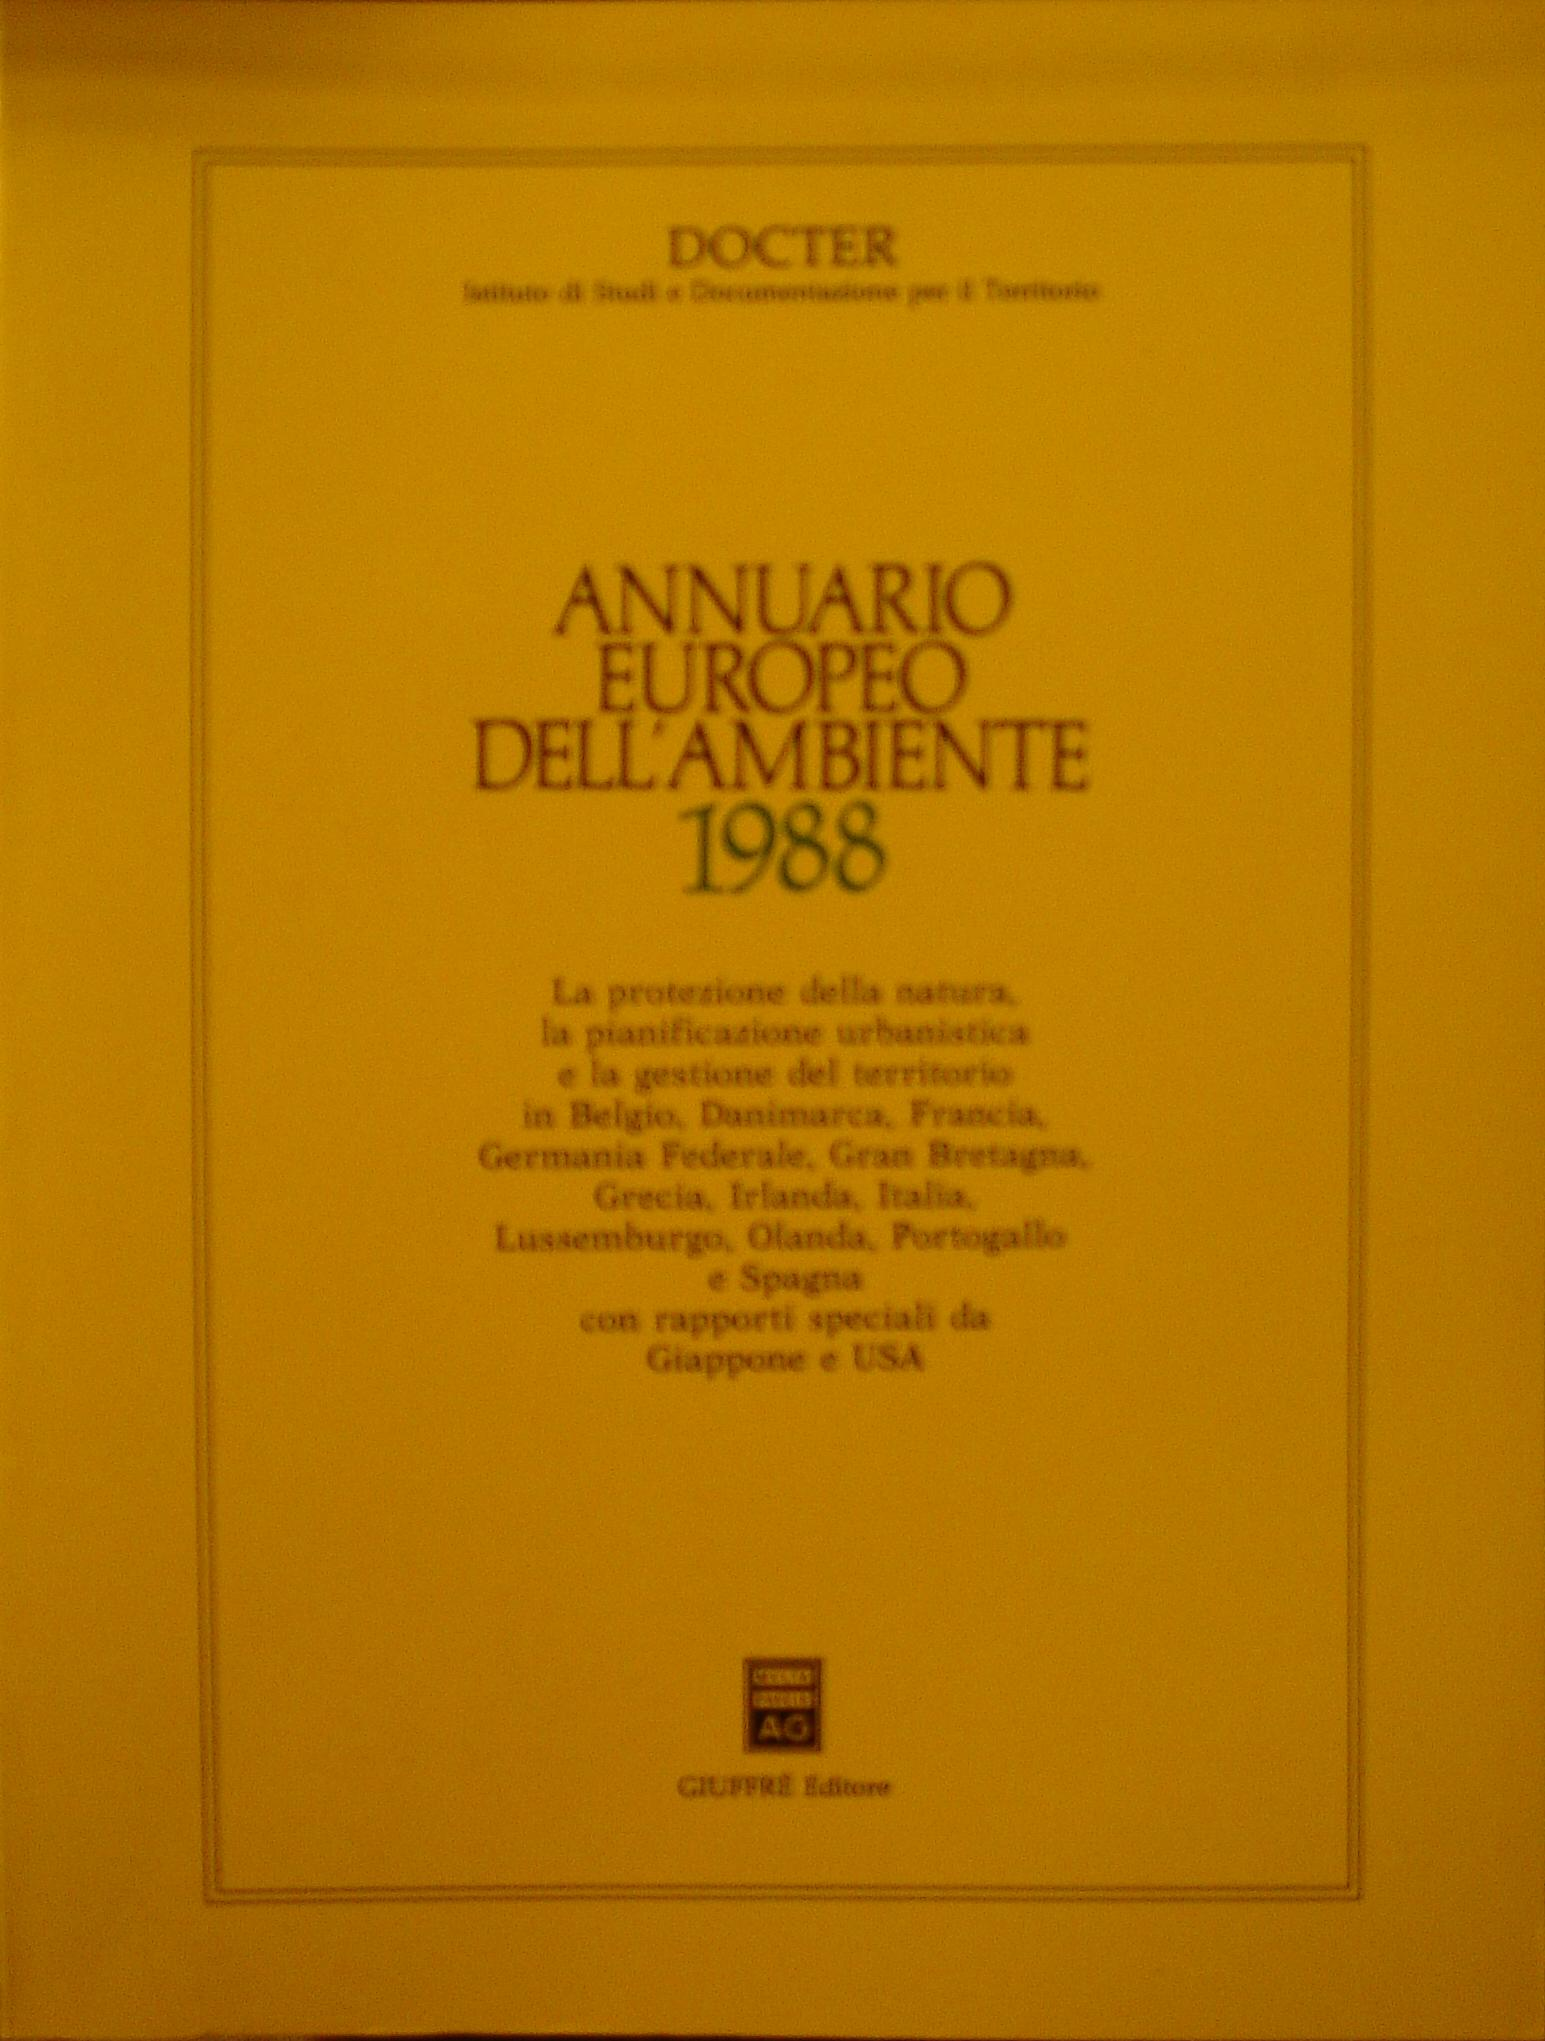 Annuario europeo dell'ambiente 1988